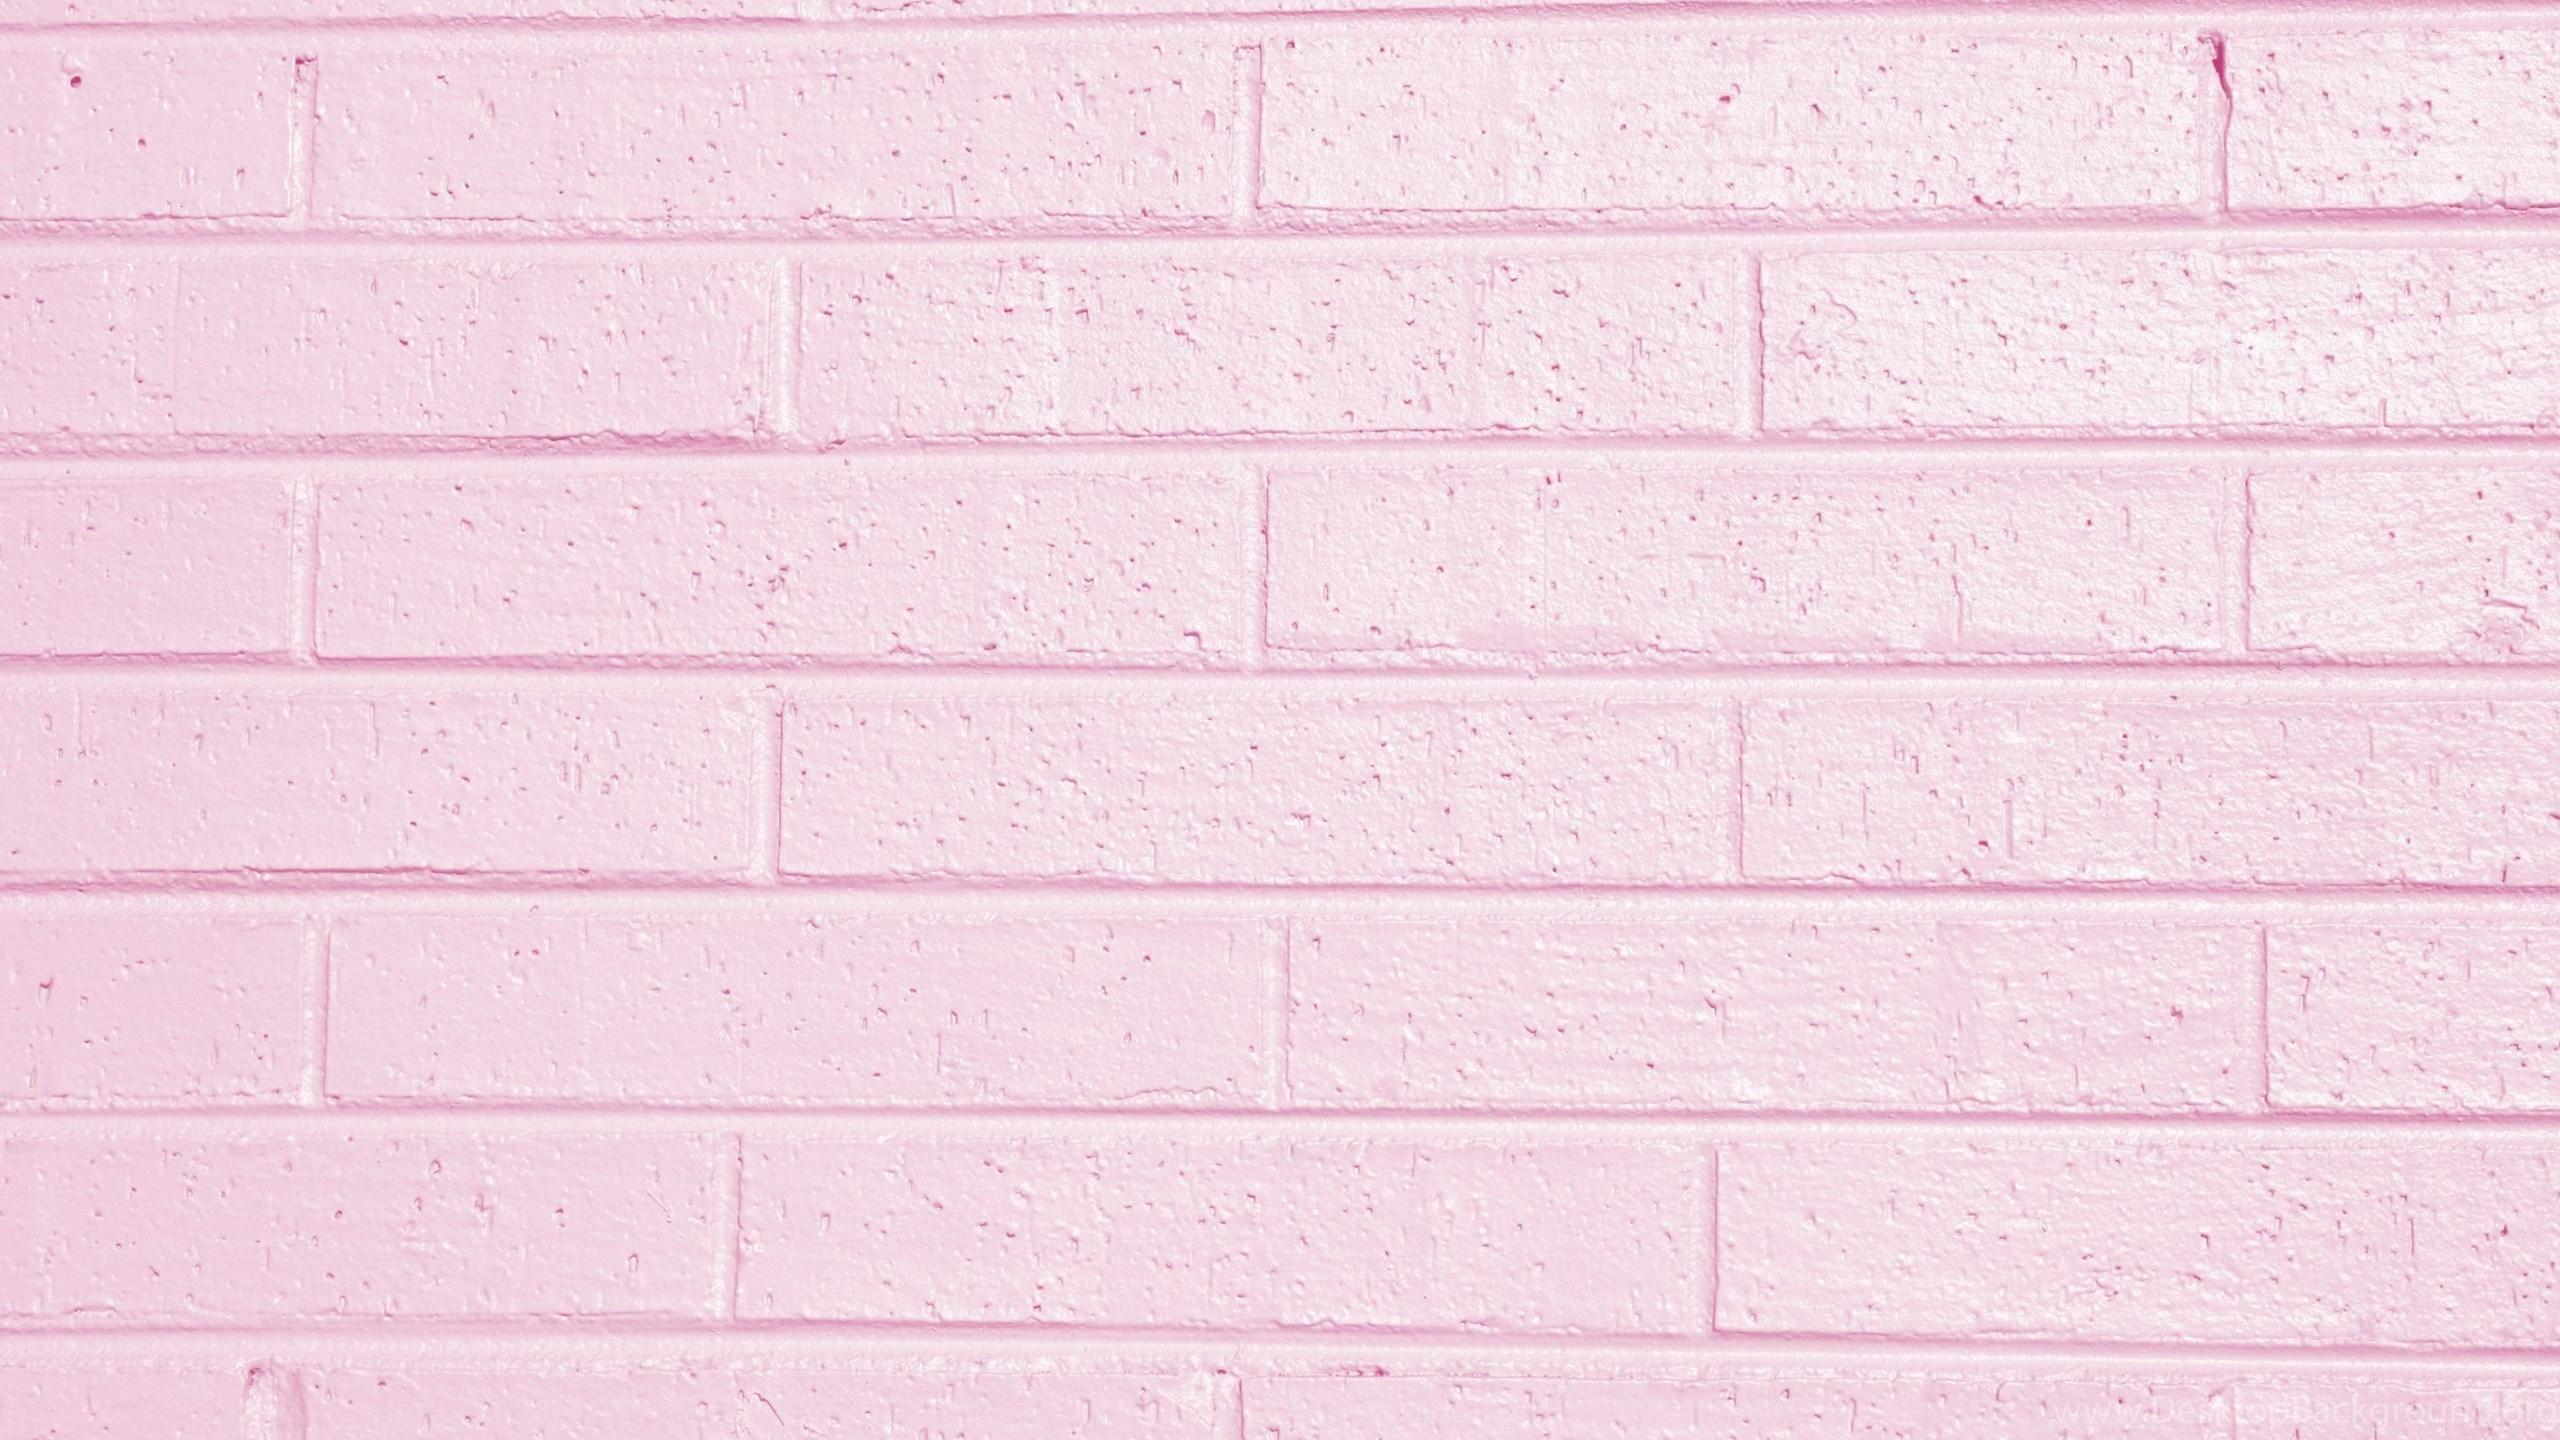 I Want The Walls Painted Black Lyrics